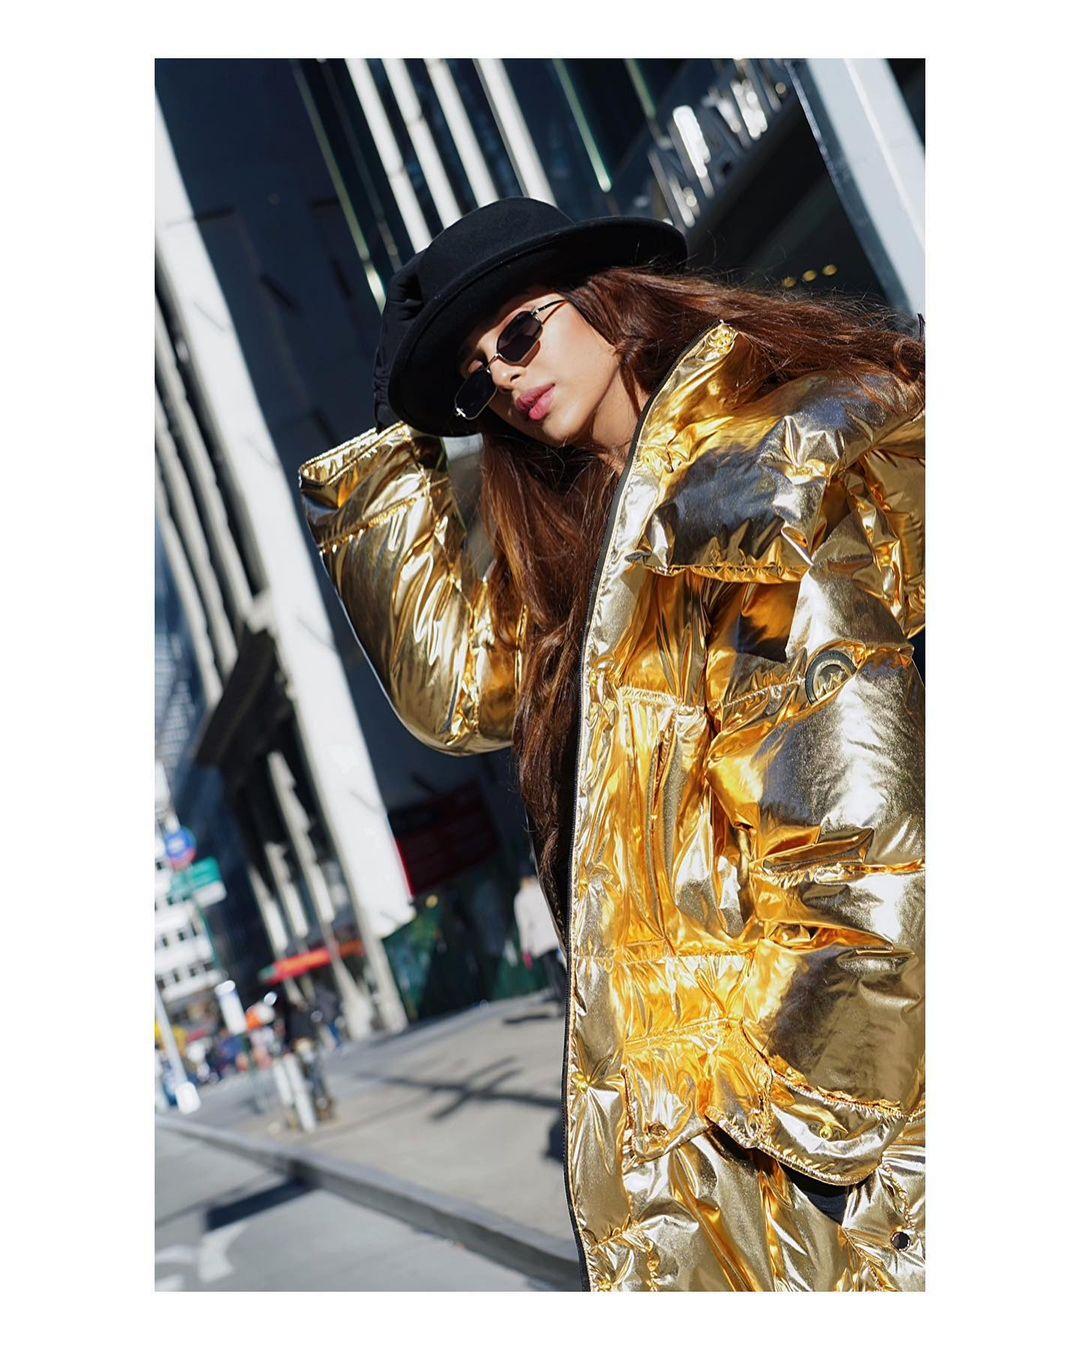 Sonya Hussyn Latest Clicks from New York